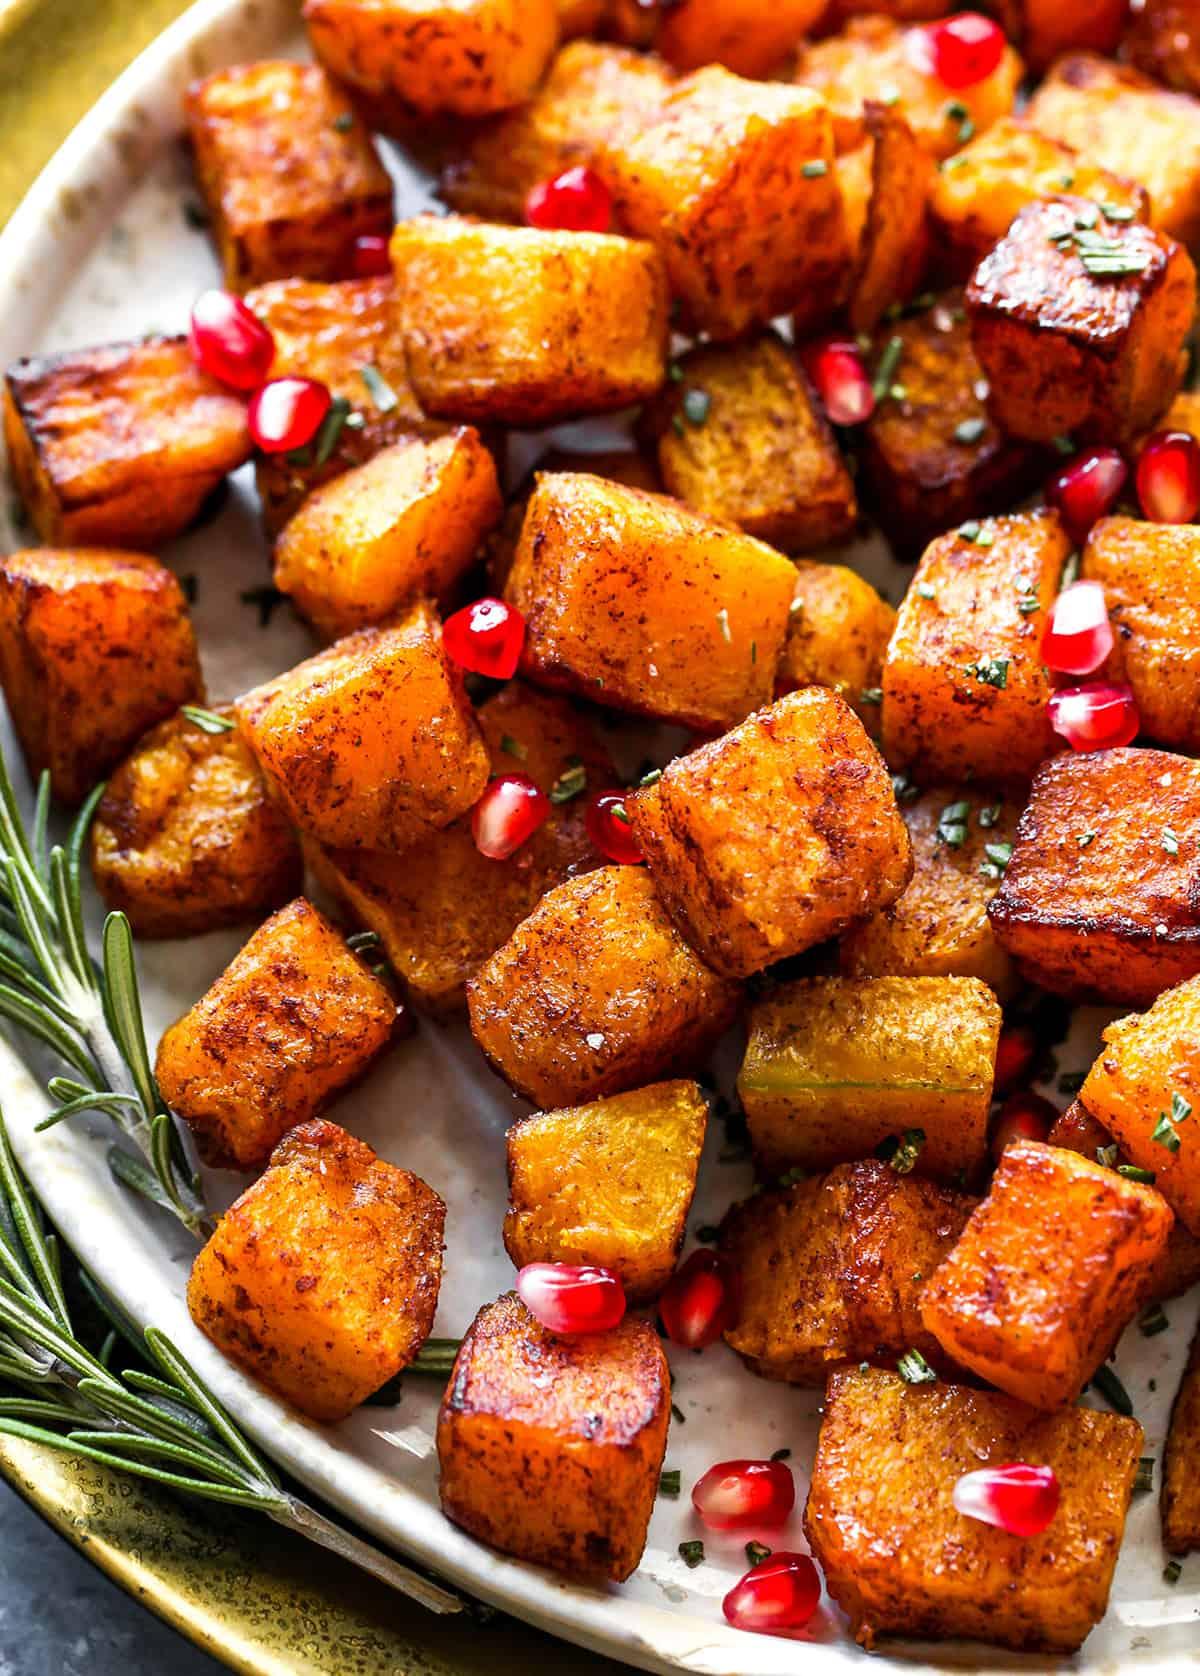 Cinnamon Roasted Butternut Squash Joyfoodsunshine